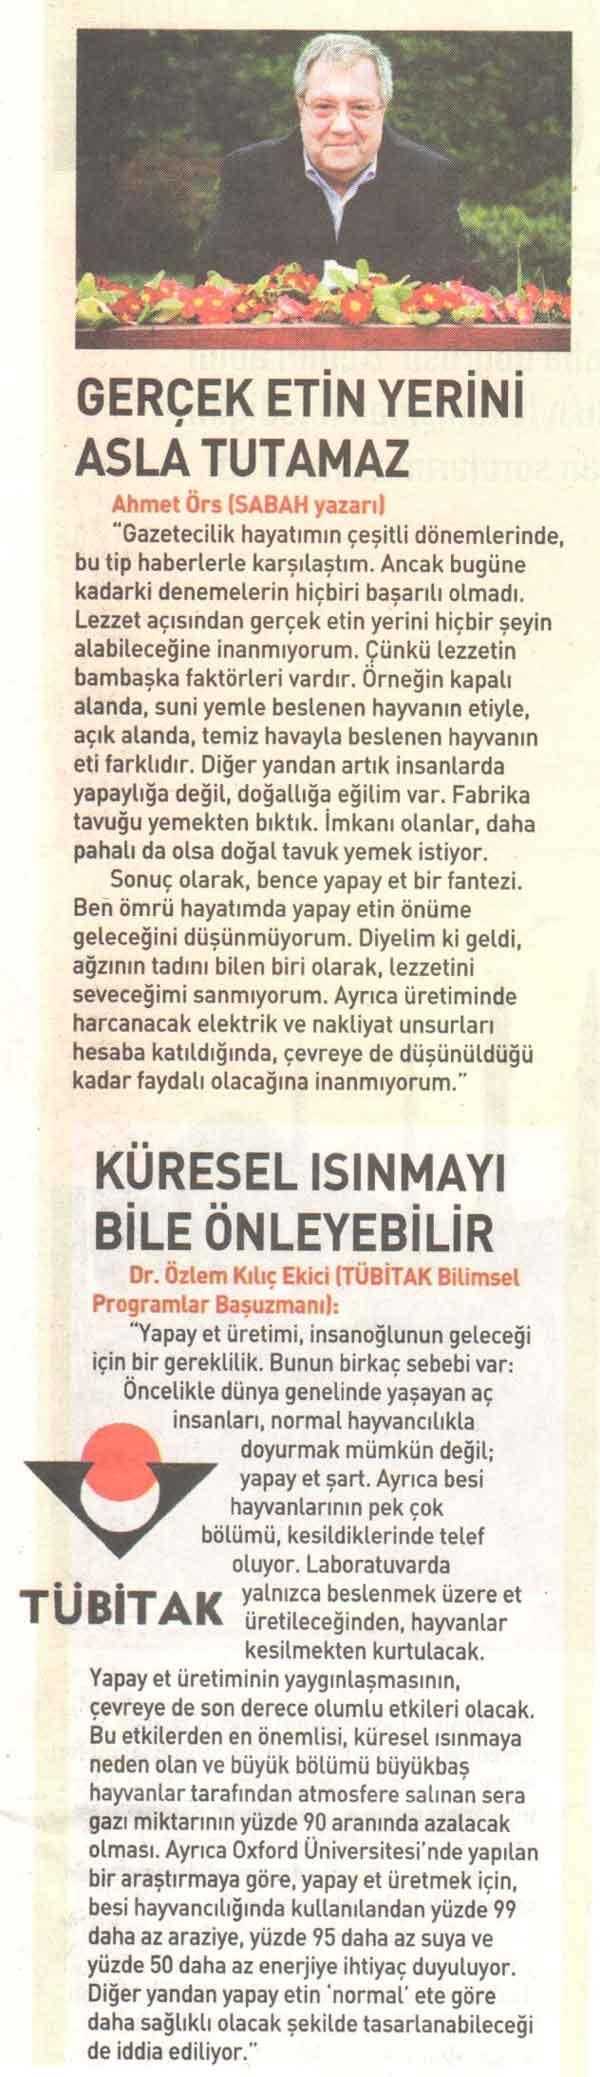 Midemizde Hayvan Mezarlığı Olmasın - Ahmet Kemal Şenpolat